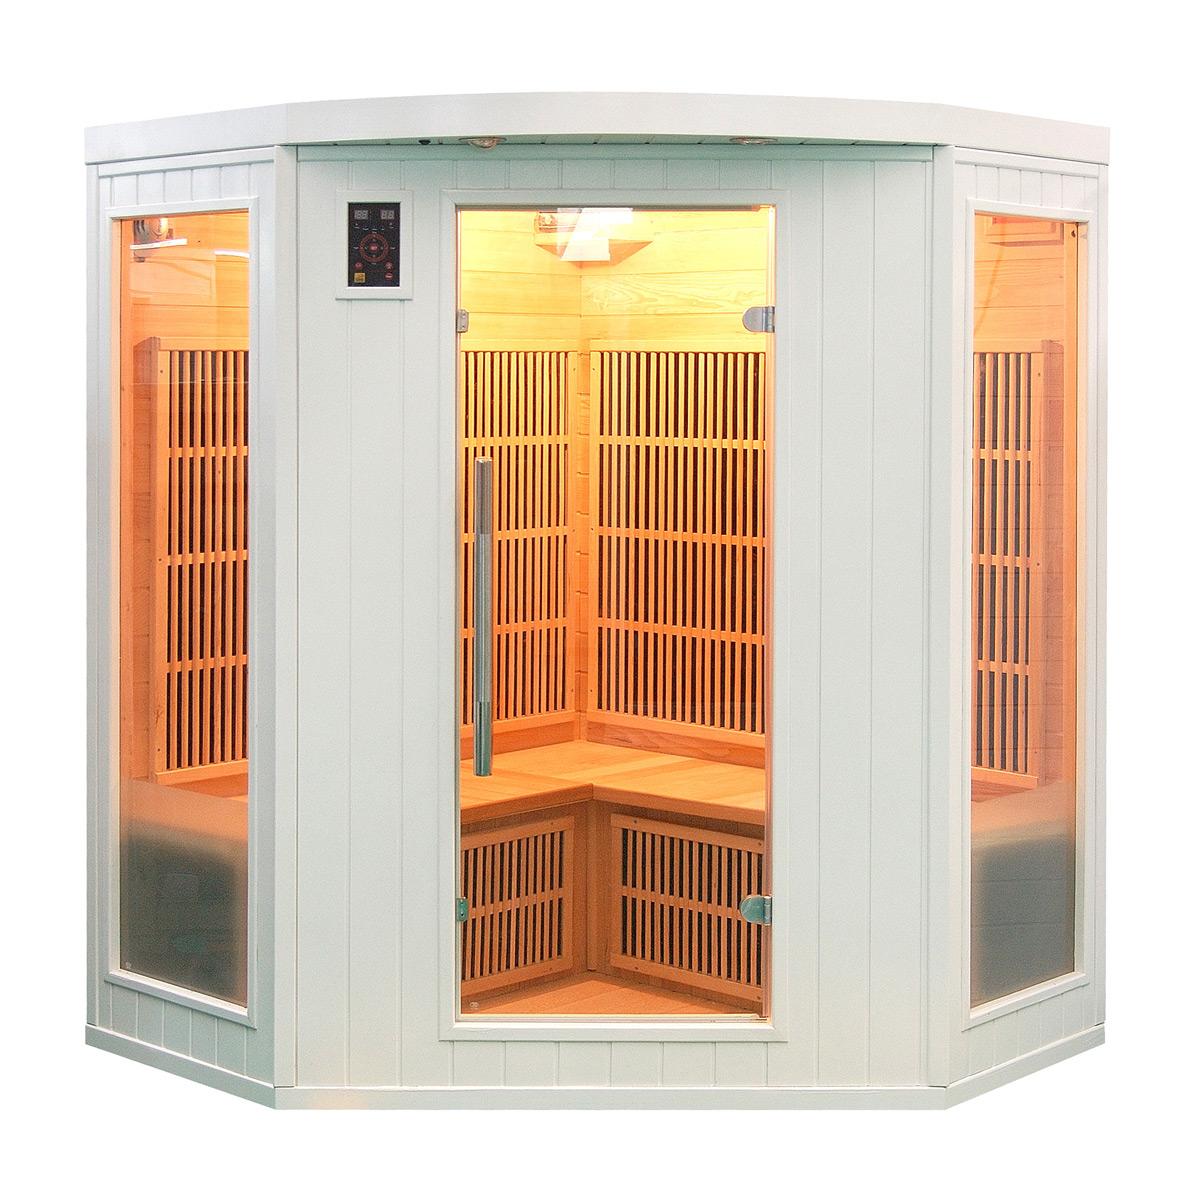 cabine sauna soleil blanc 3 4 places. Black Bedroom Furniture Sets. Home Design Ideas